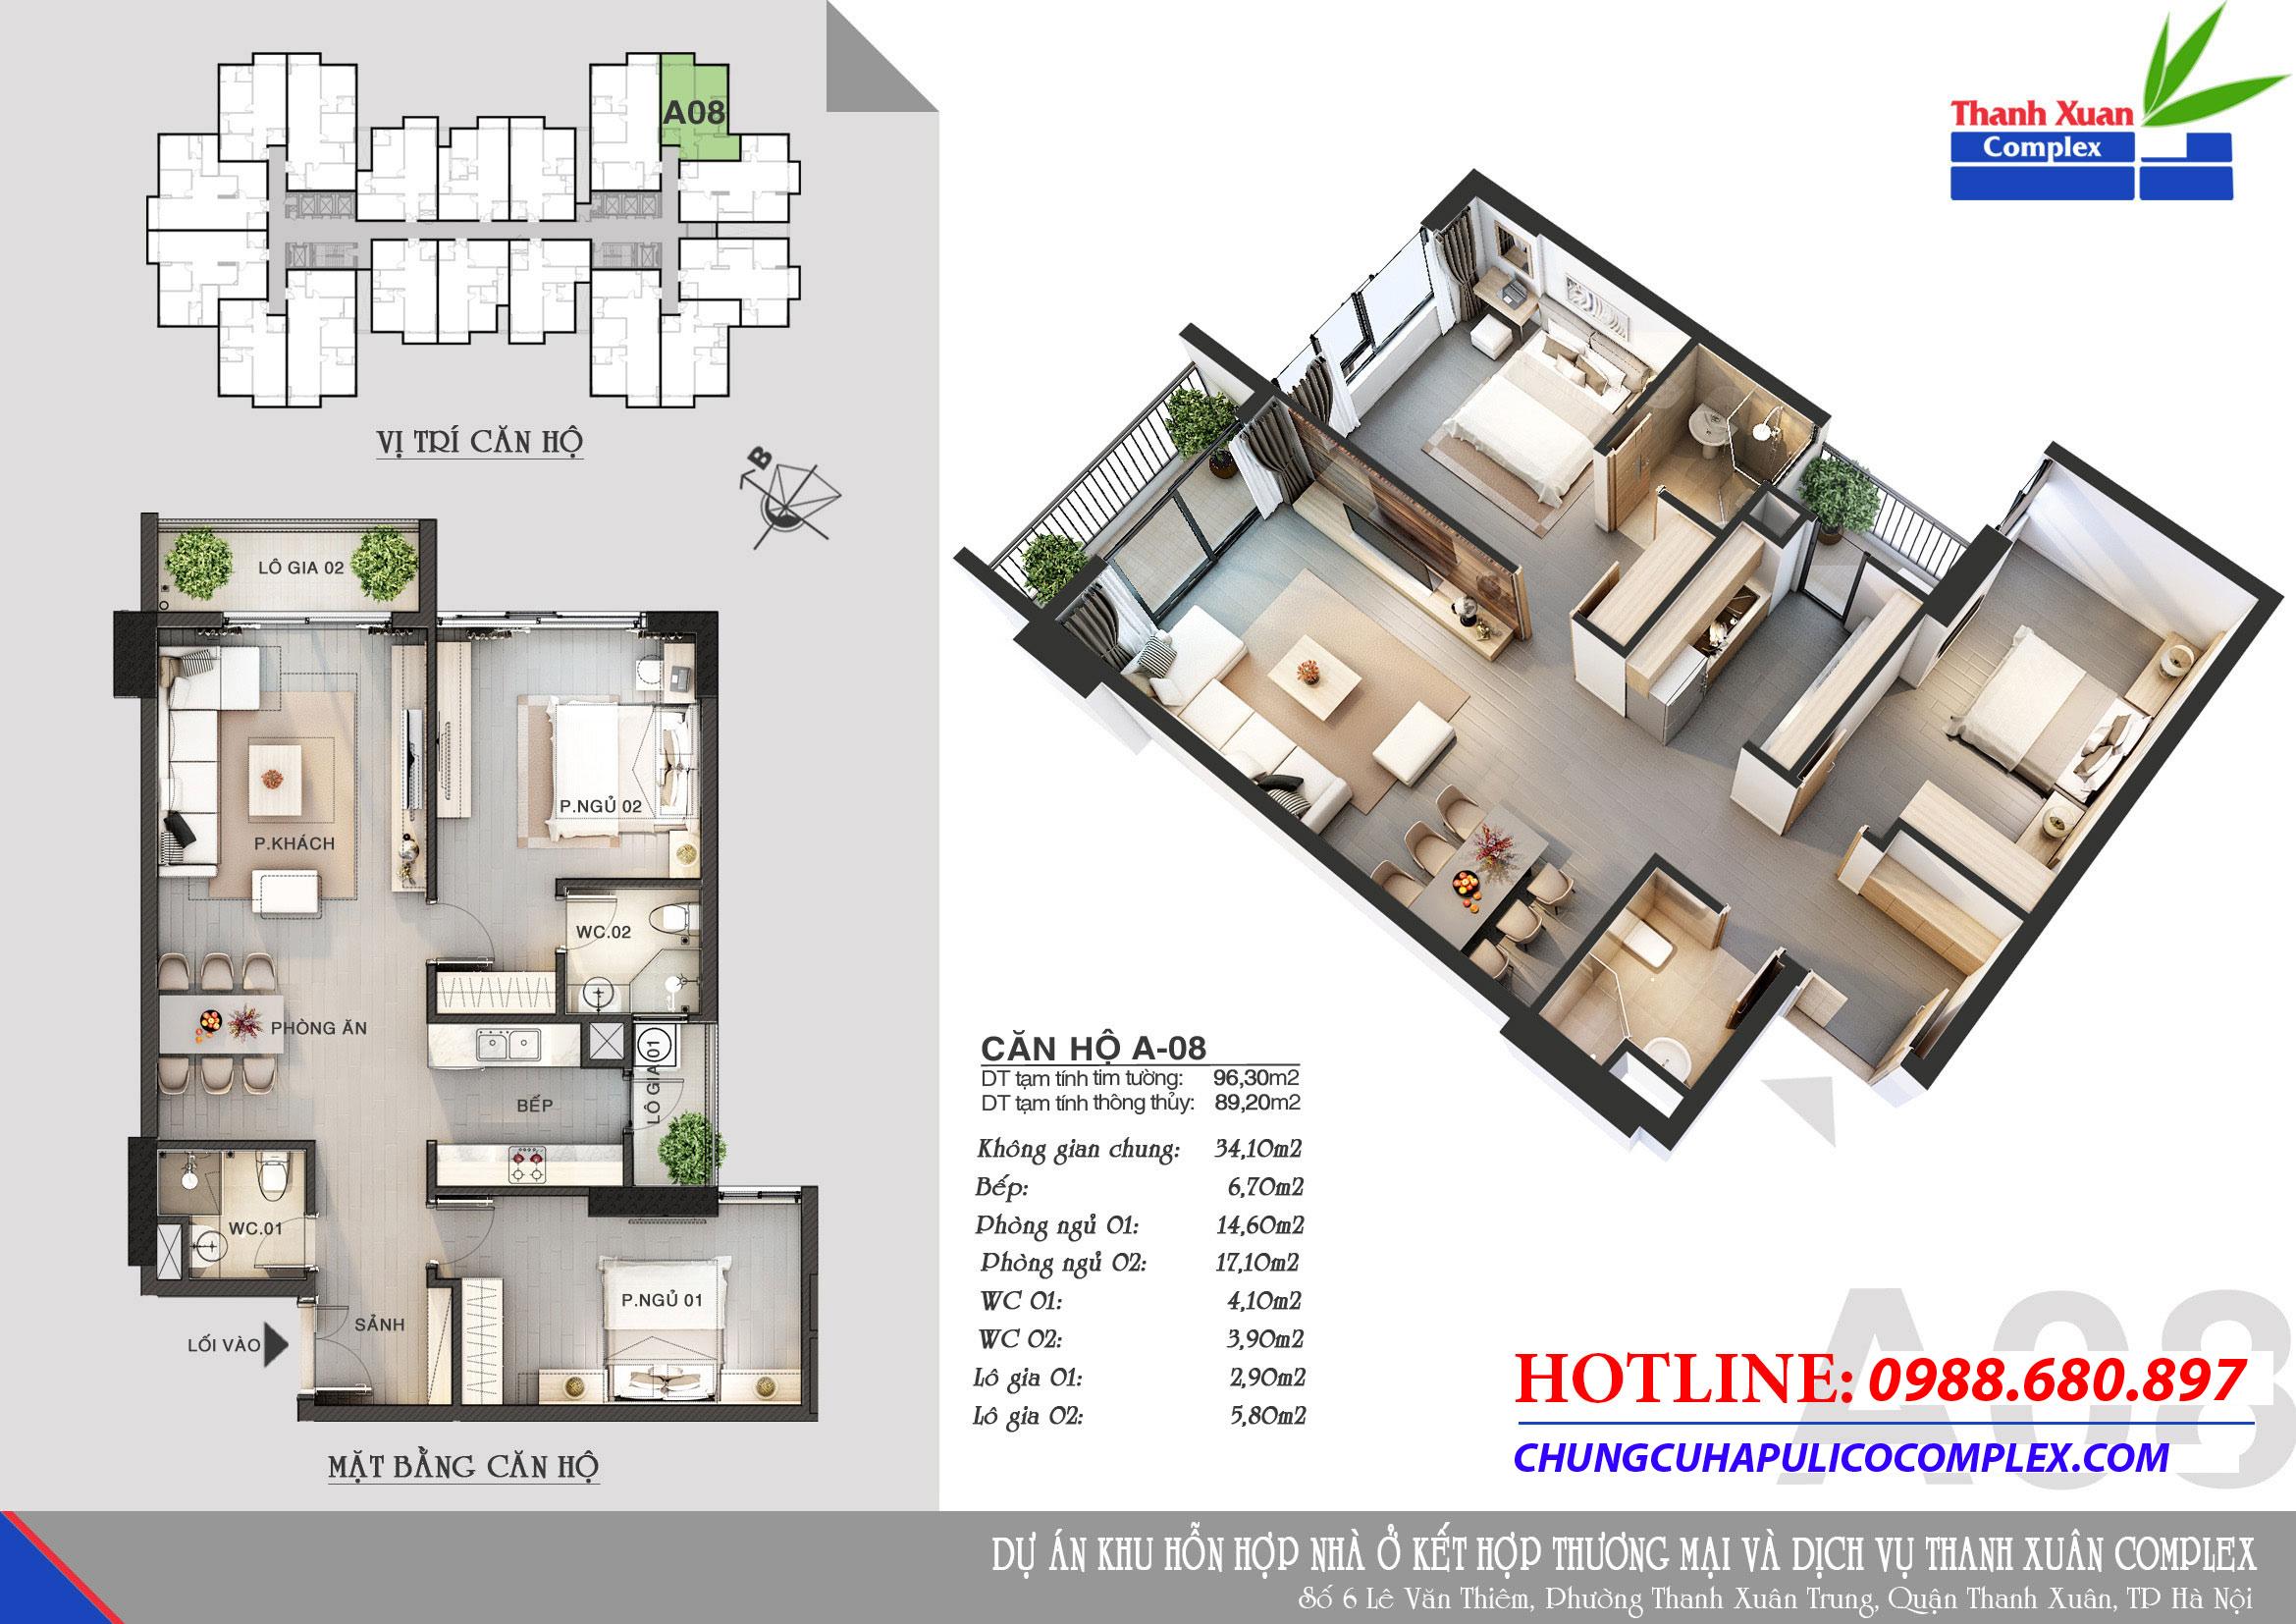 HSB_Thanhxuan-complex_CH-A08_suachotT42016-copy